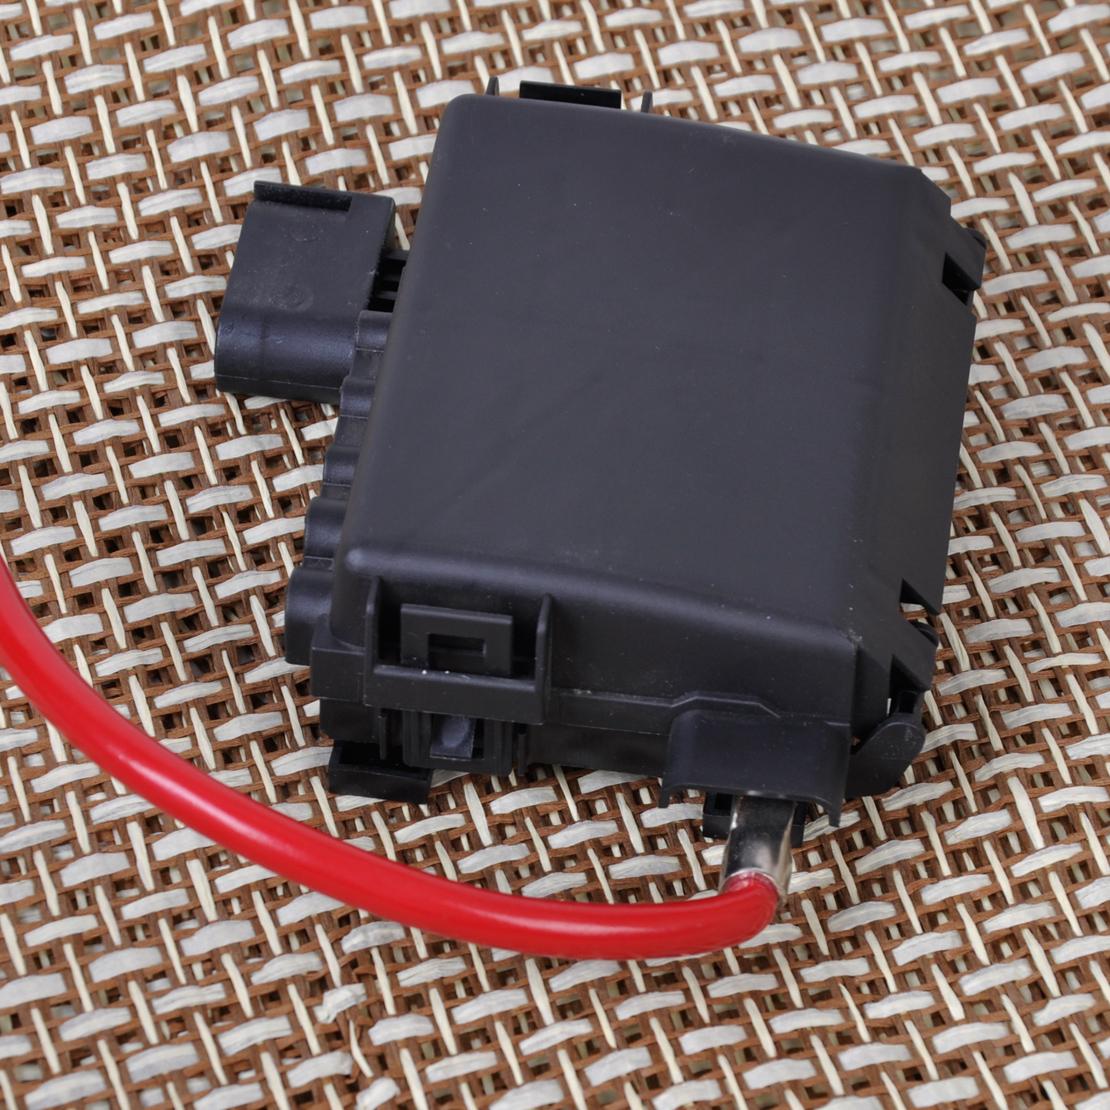 2003 jetta battery fuse box new    fuse       box       battery    terminal for vw beetle golf bora  new    fuse       box       battery    terminal for vw beetle golf bora